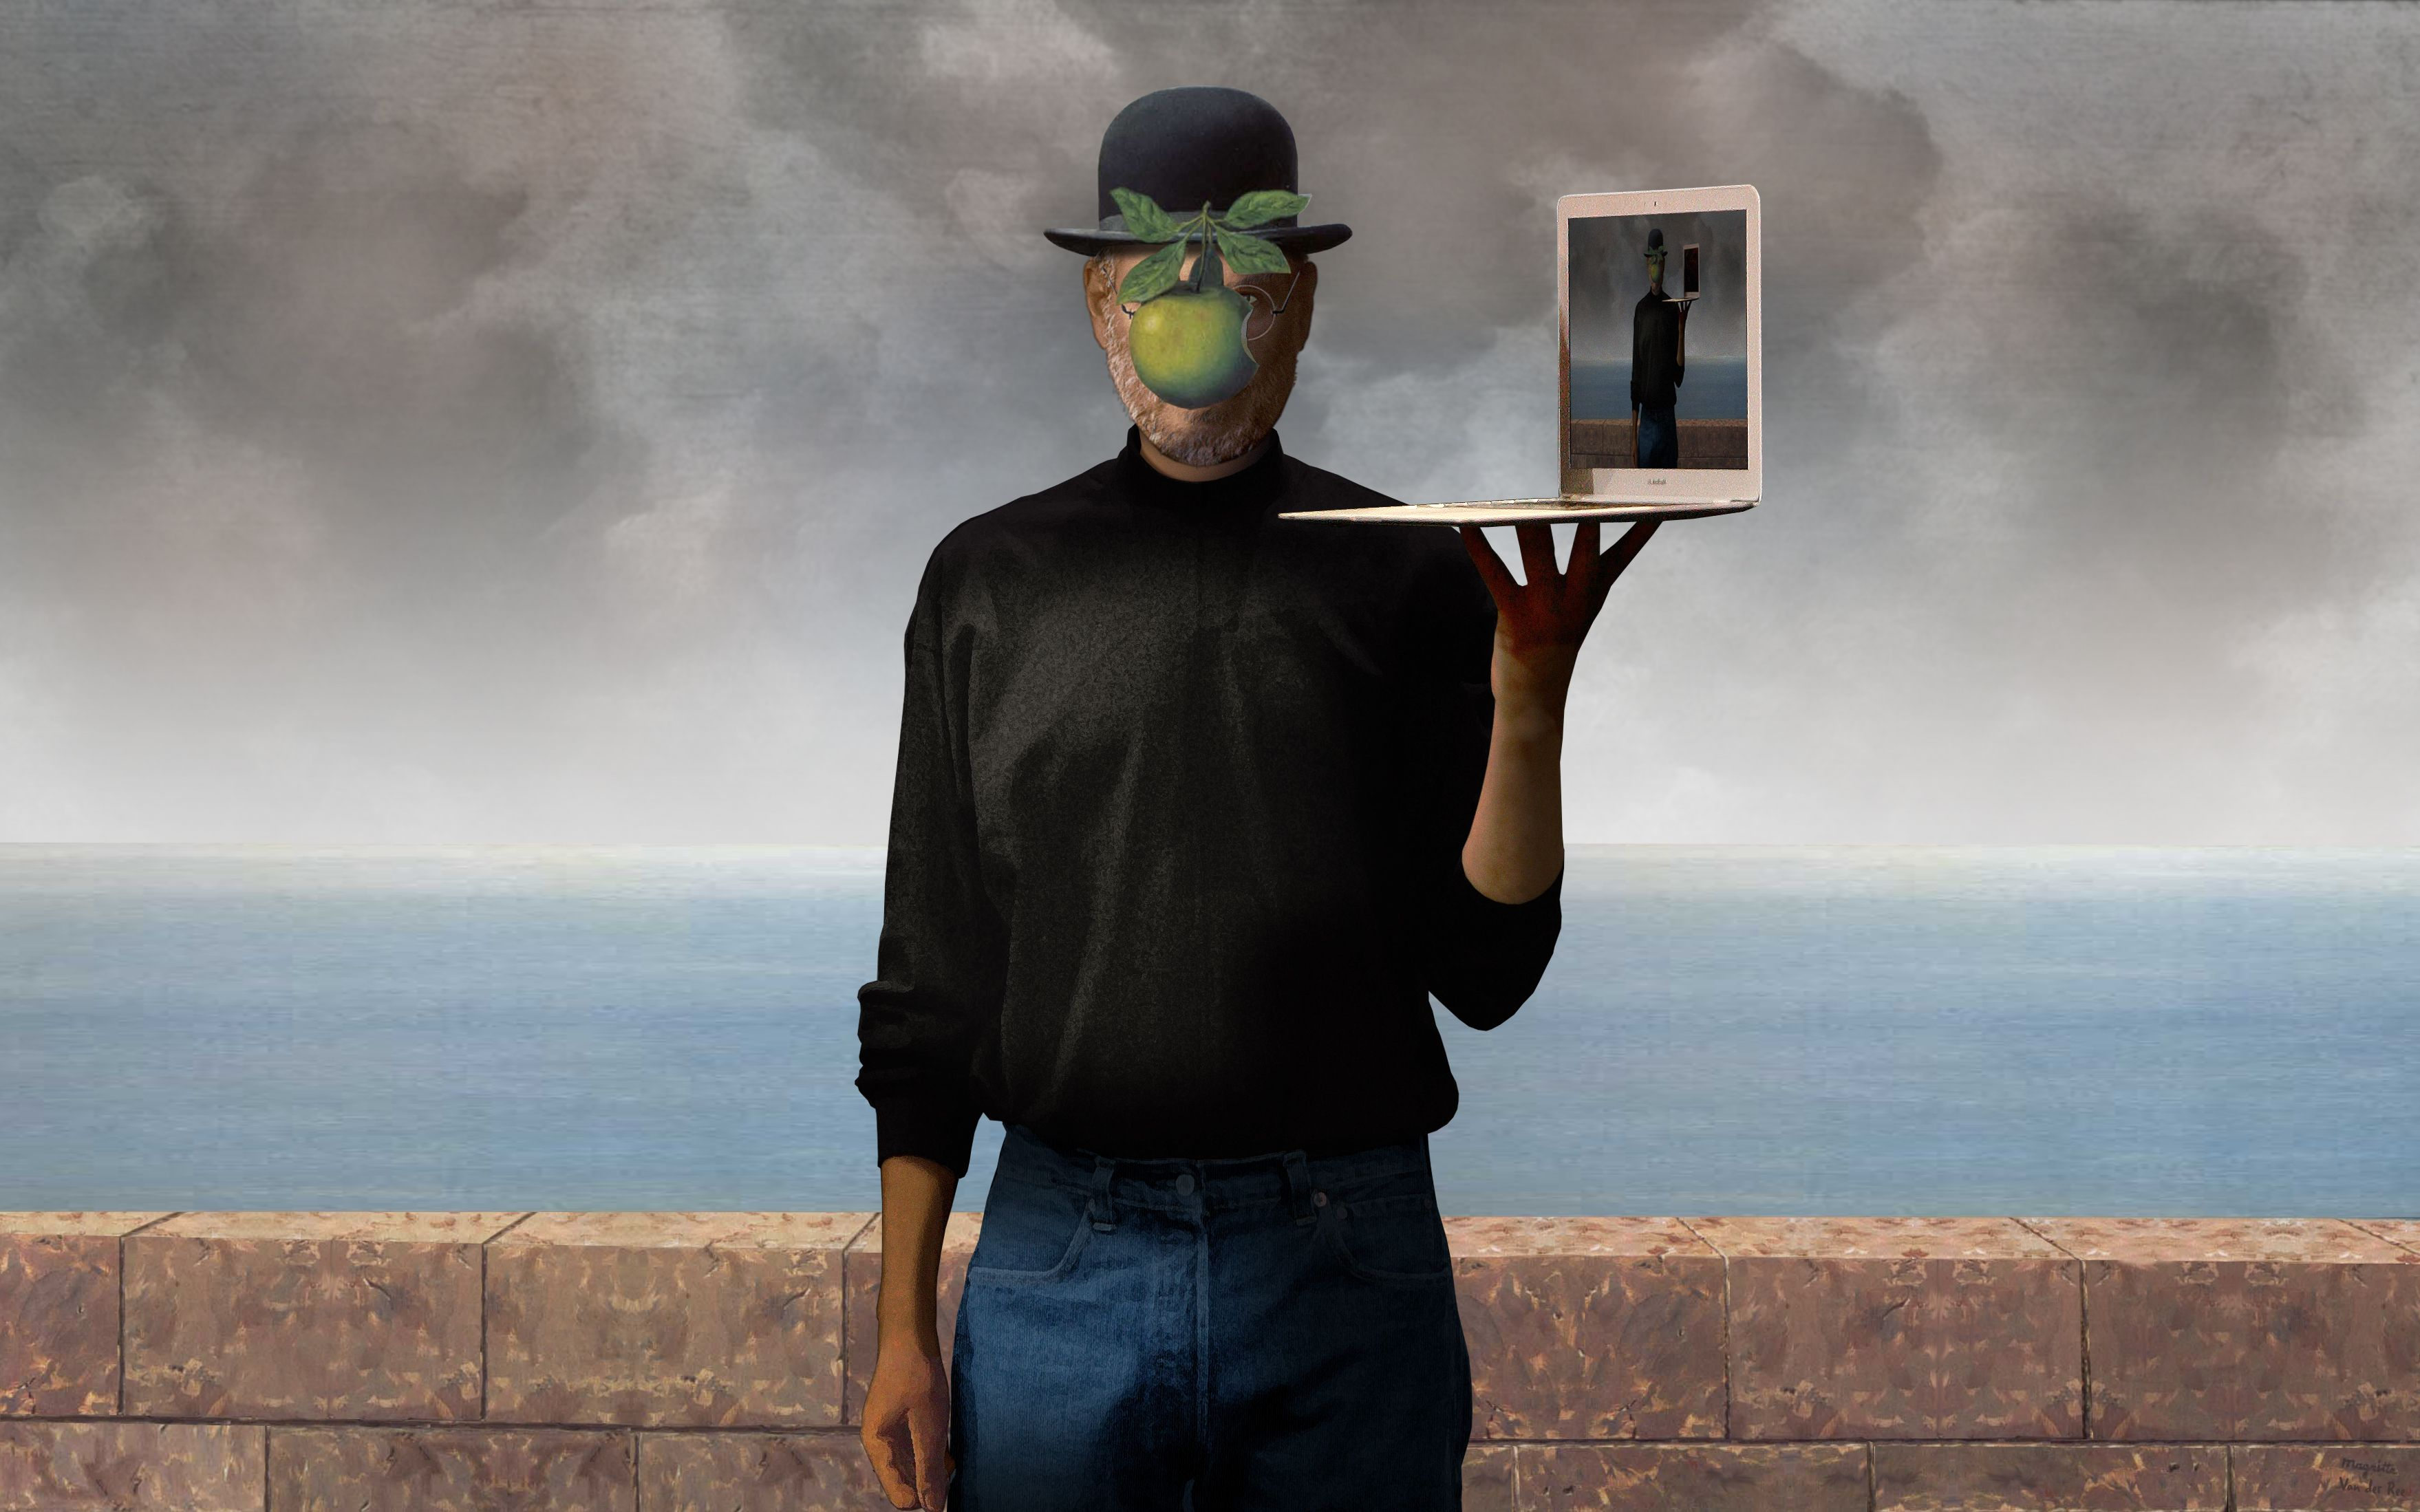 условия картинки людей вместо лица сети